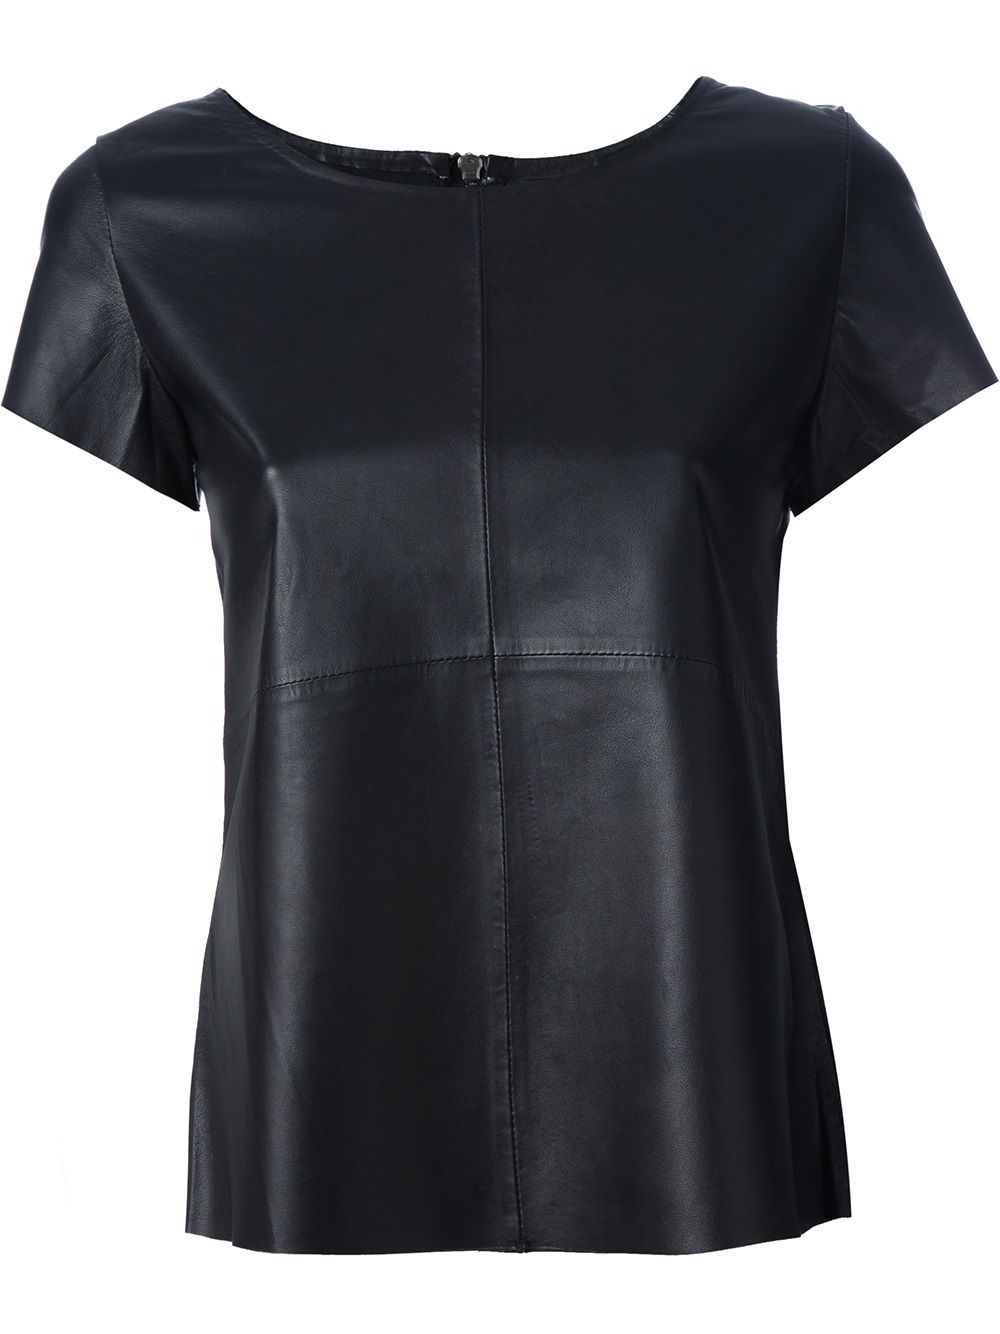 974f6788153b7 black leather shirt women - Google Search